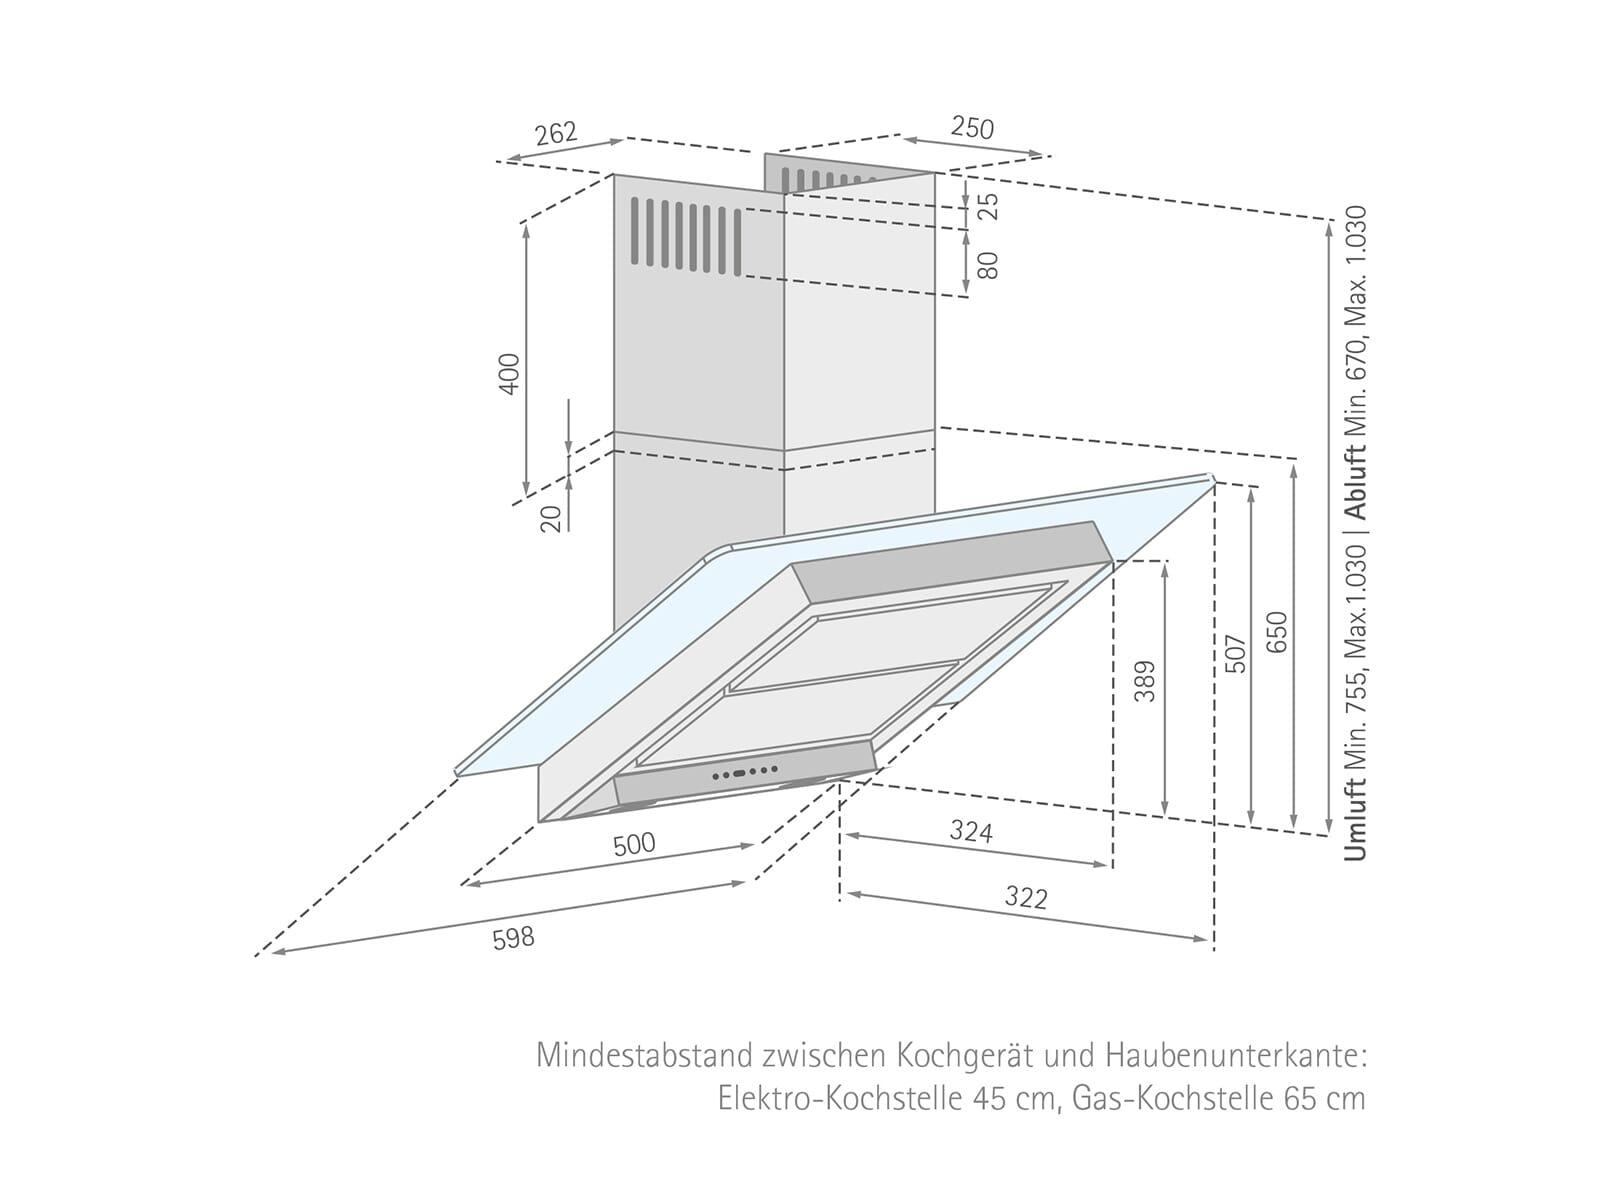 Silverline Perla Deluxe PEW 685.2 ES Kopffreihaube Edelstahl/Sandglas